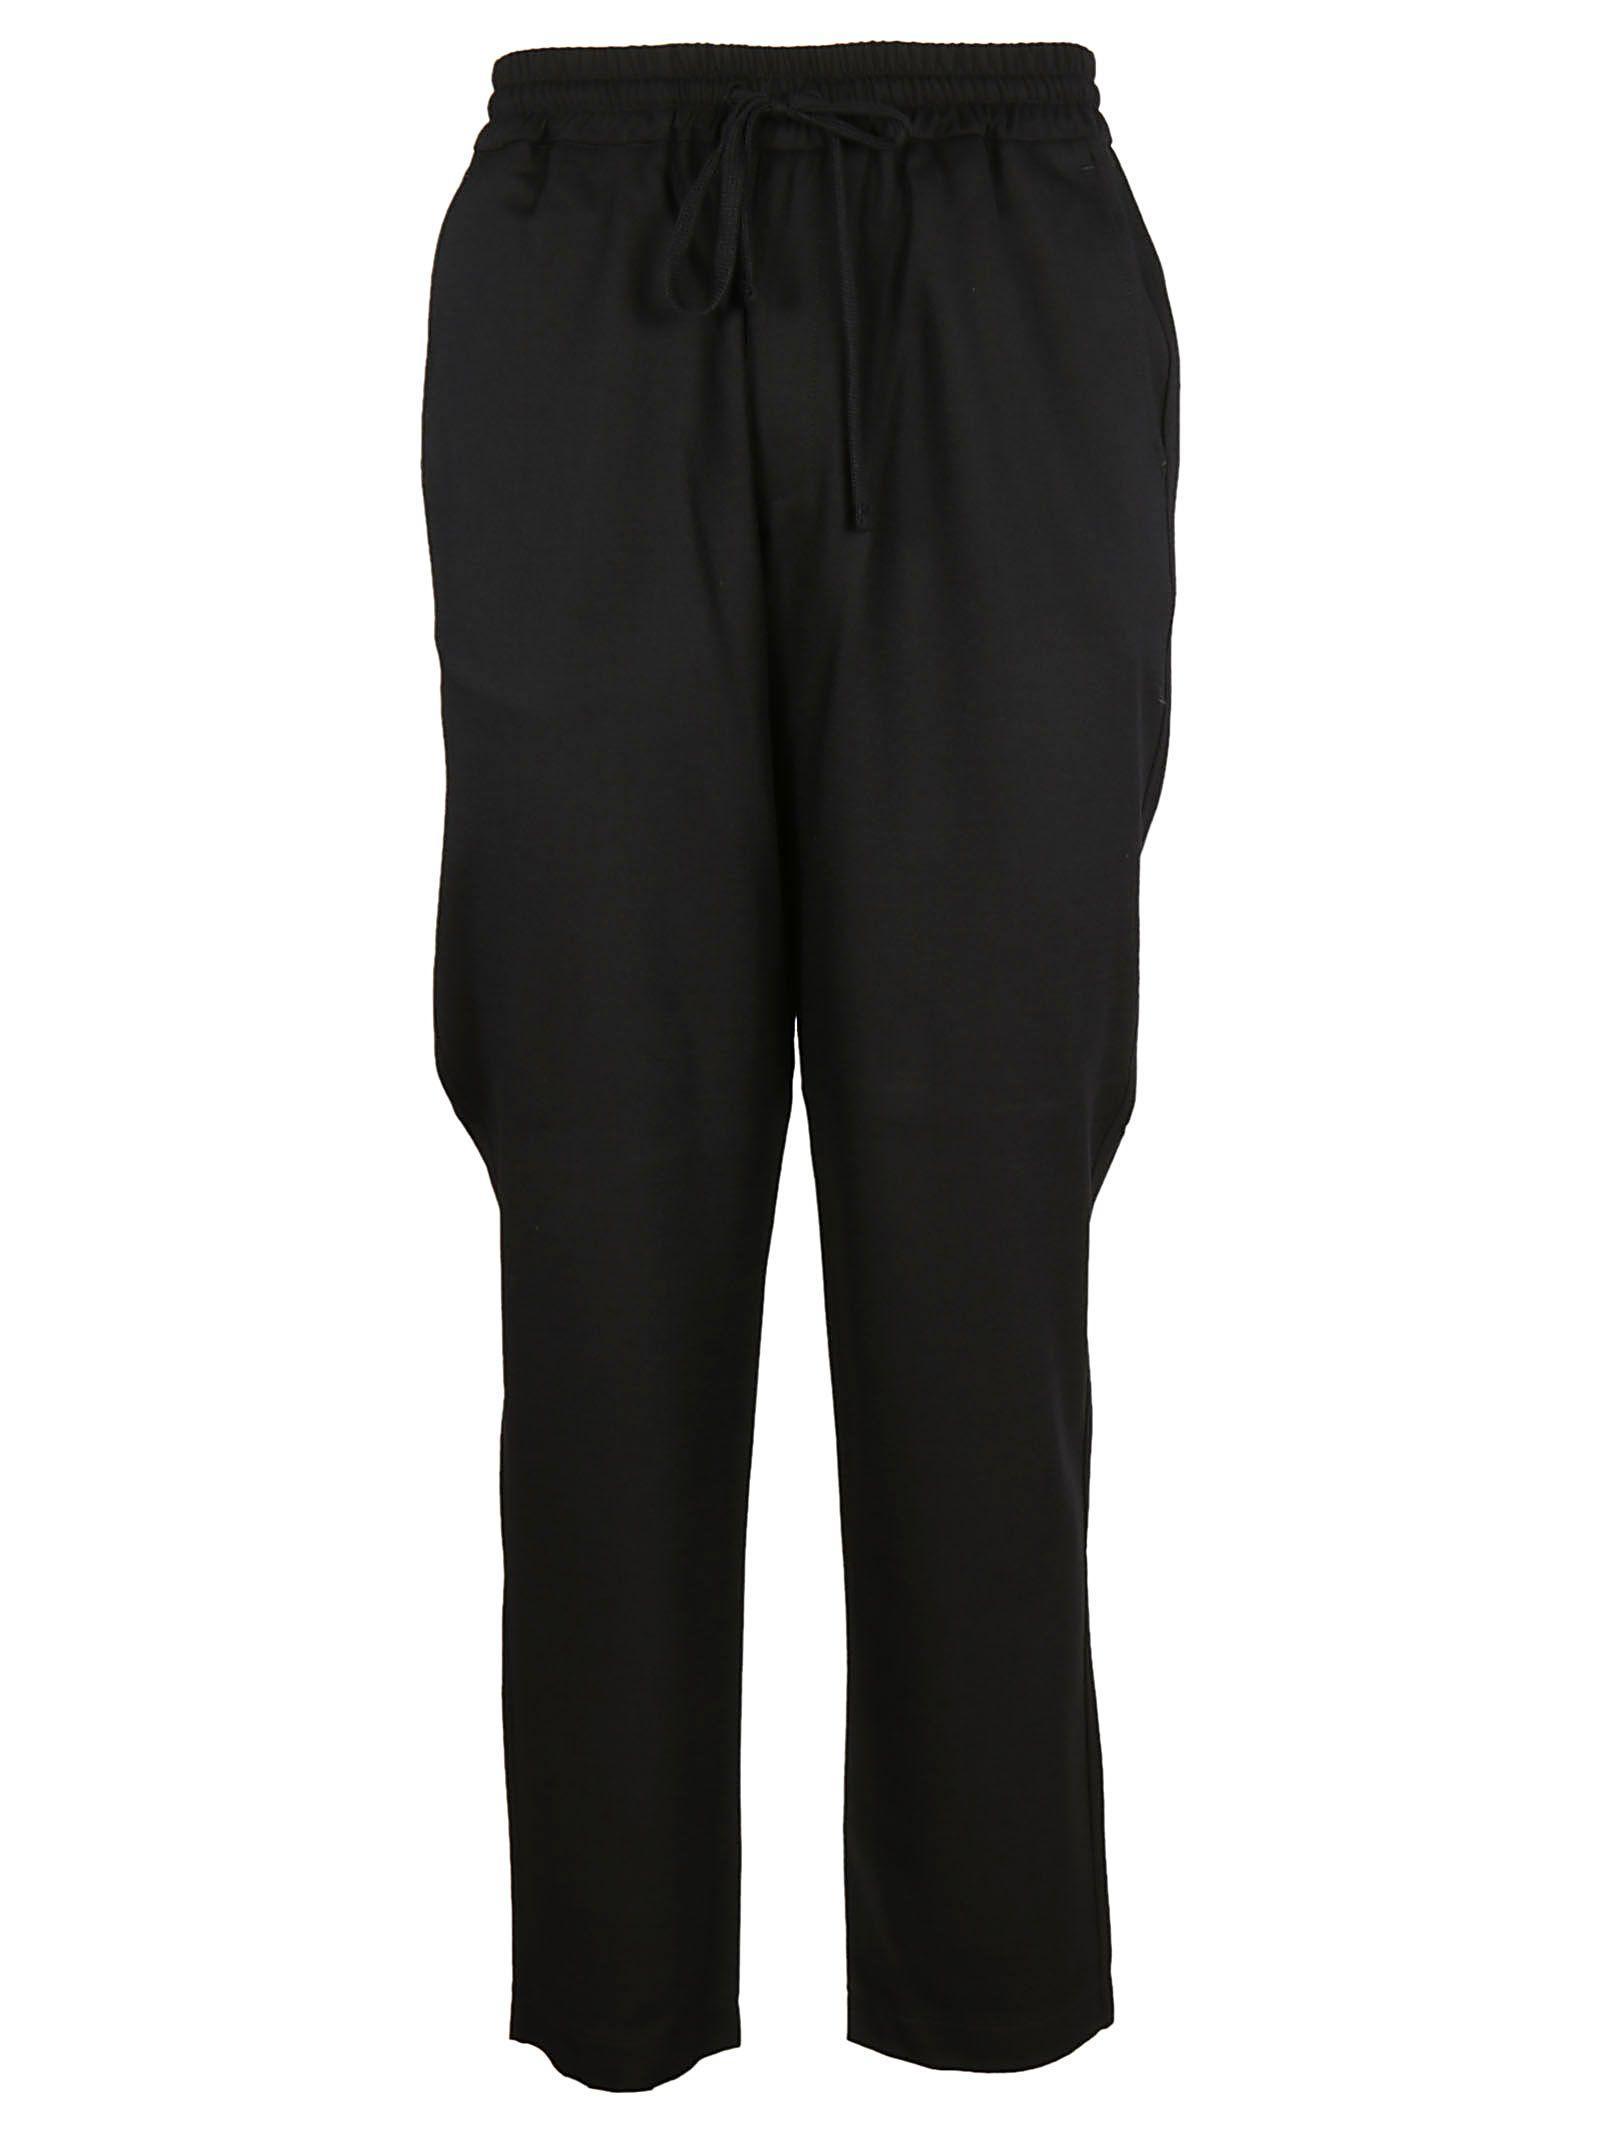 Barena Venezia Classic Track Pants In Black